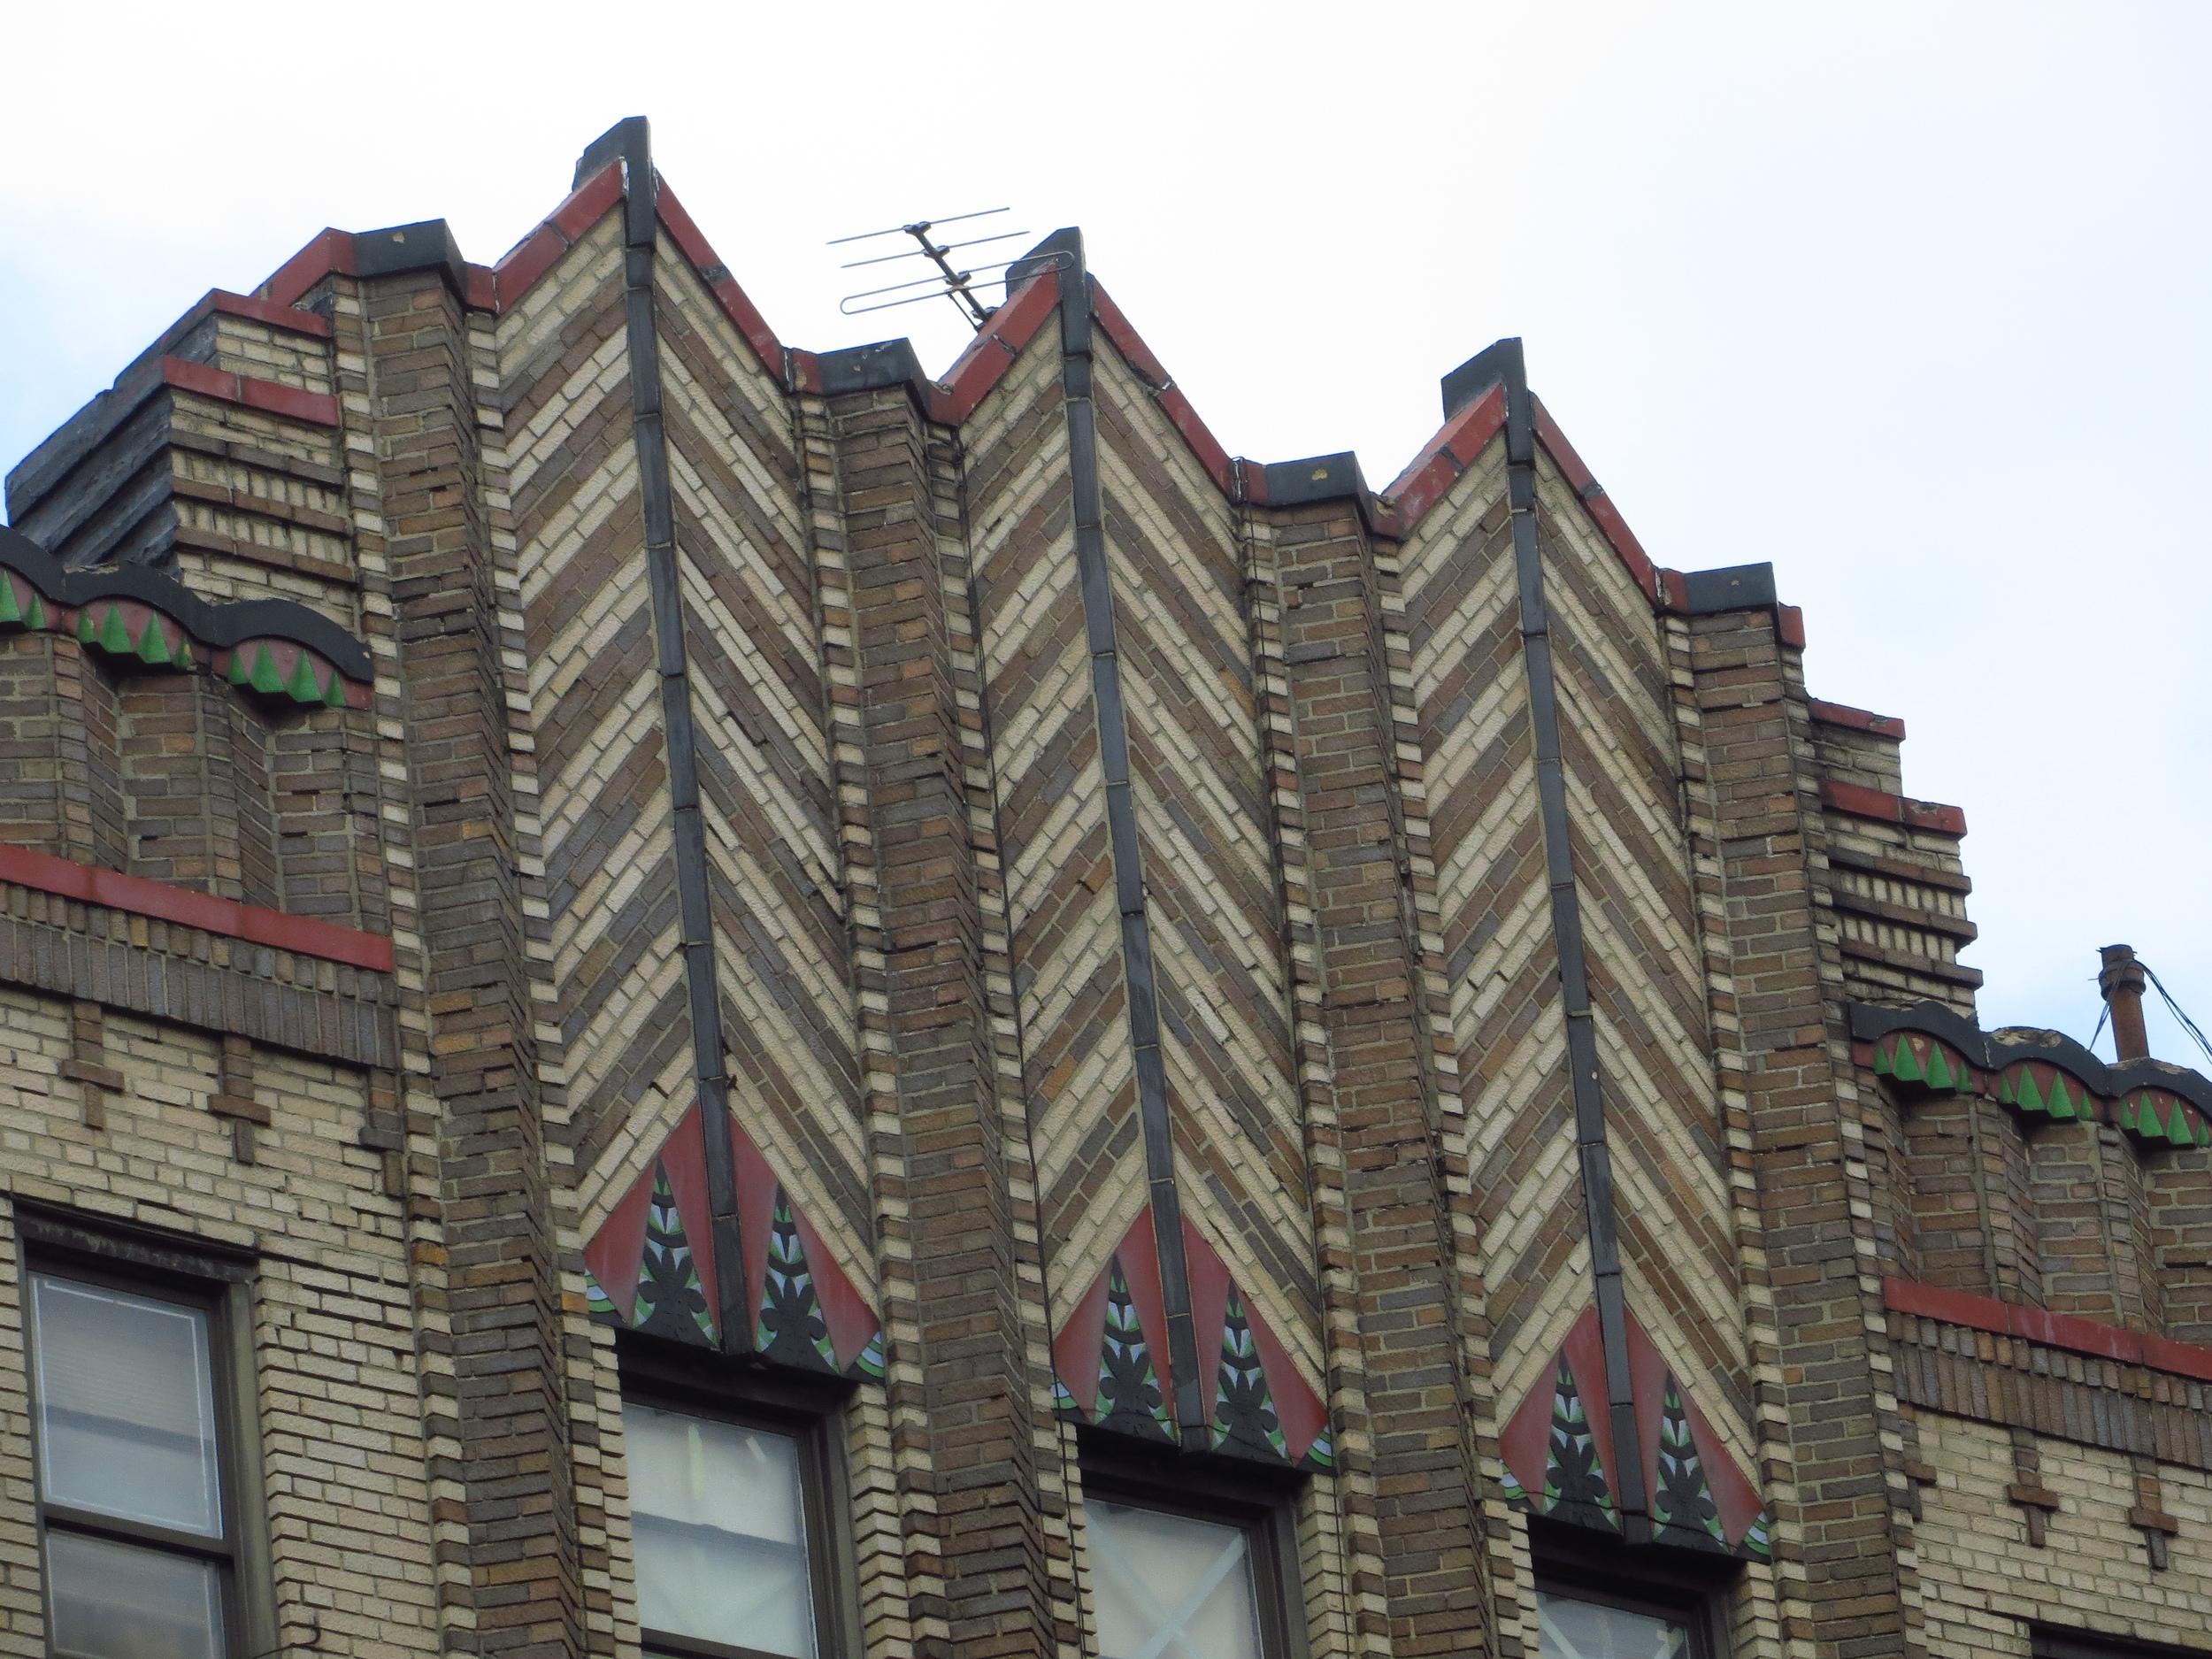 Cool brick patterns